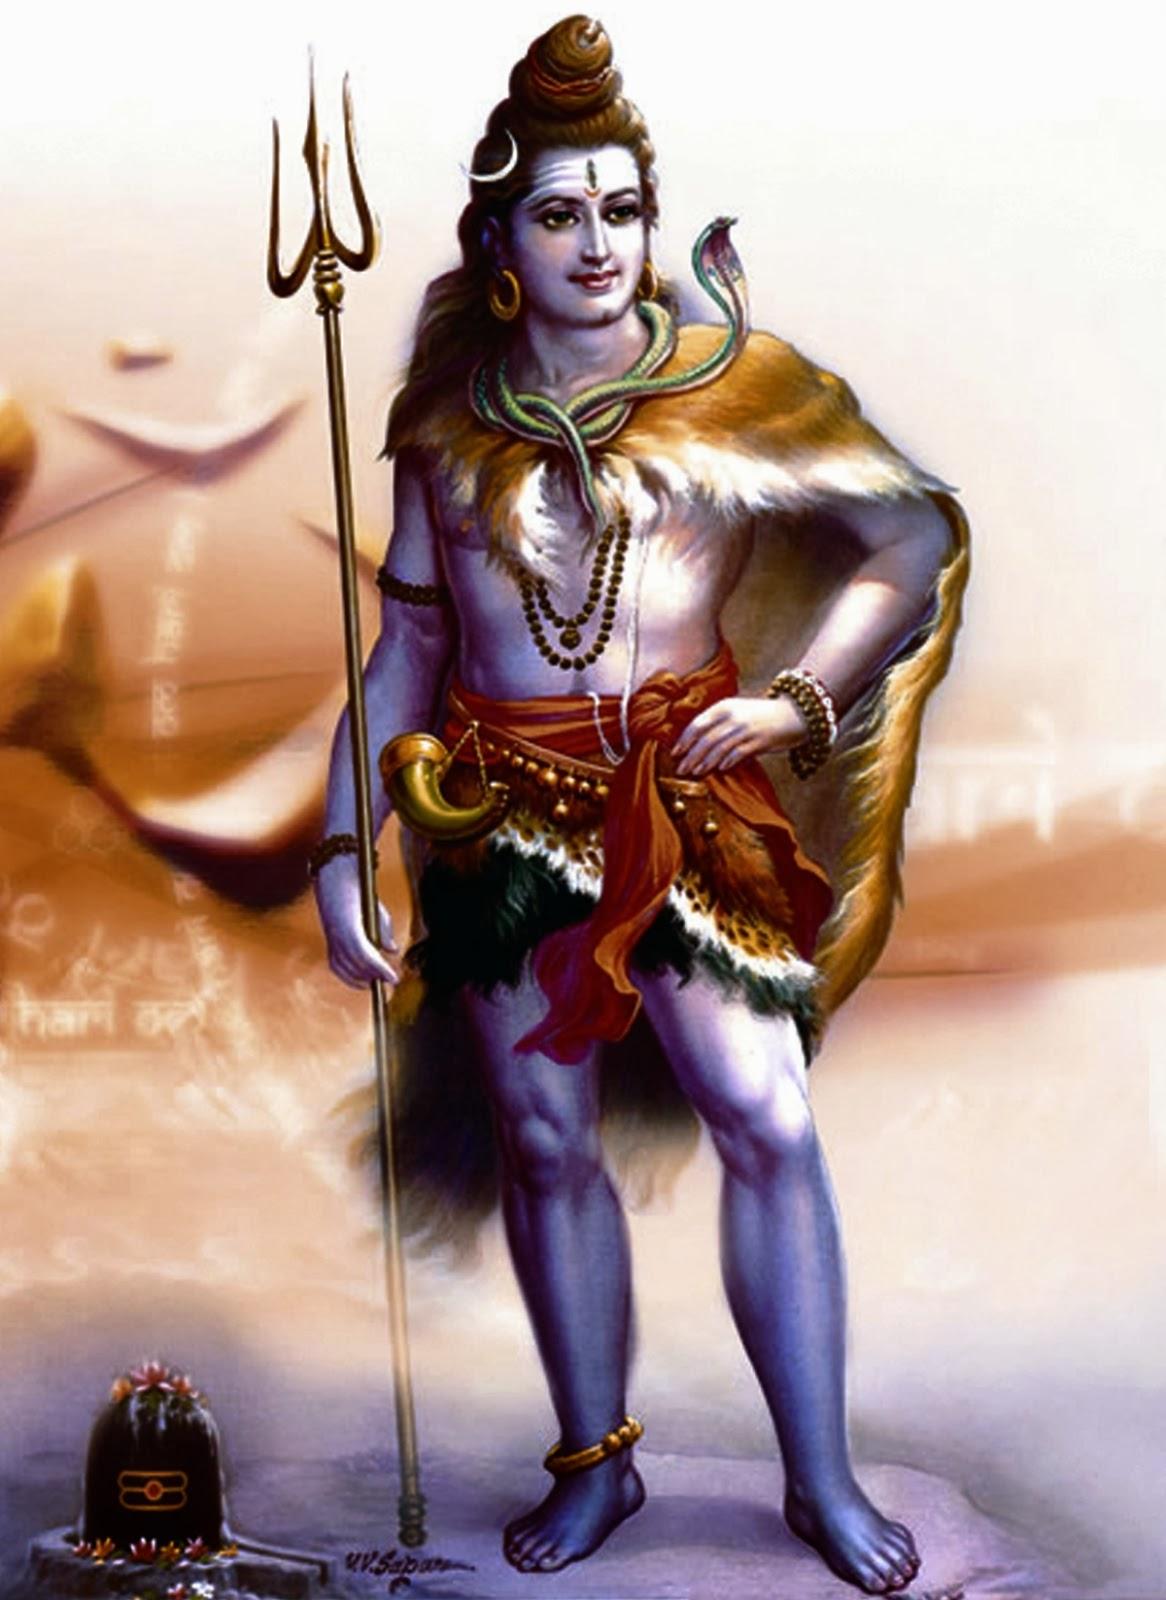 Lord-Shiva-Wallpapers-0111.jpg